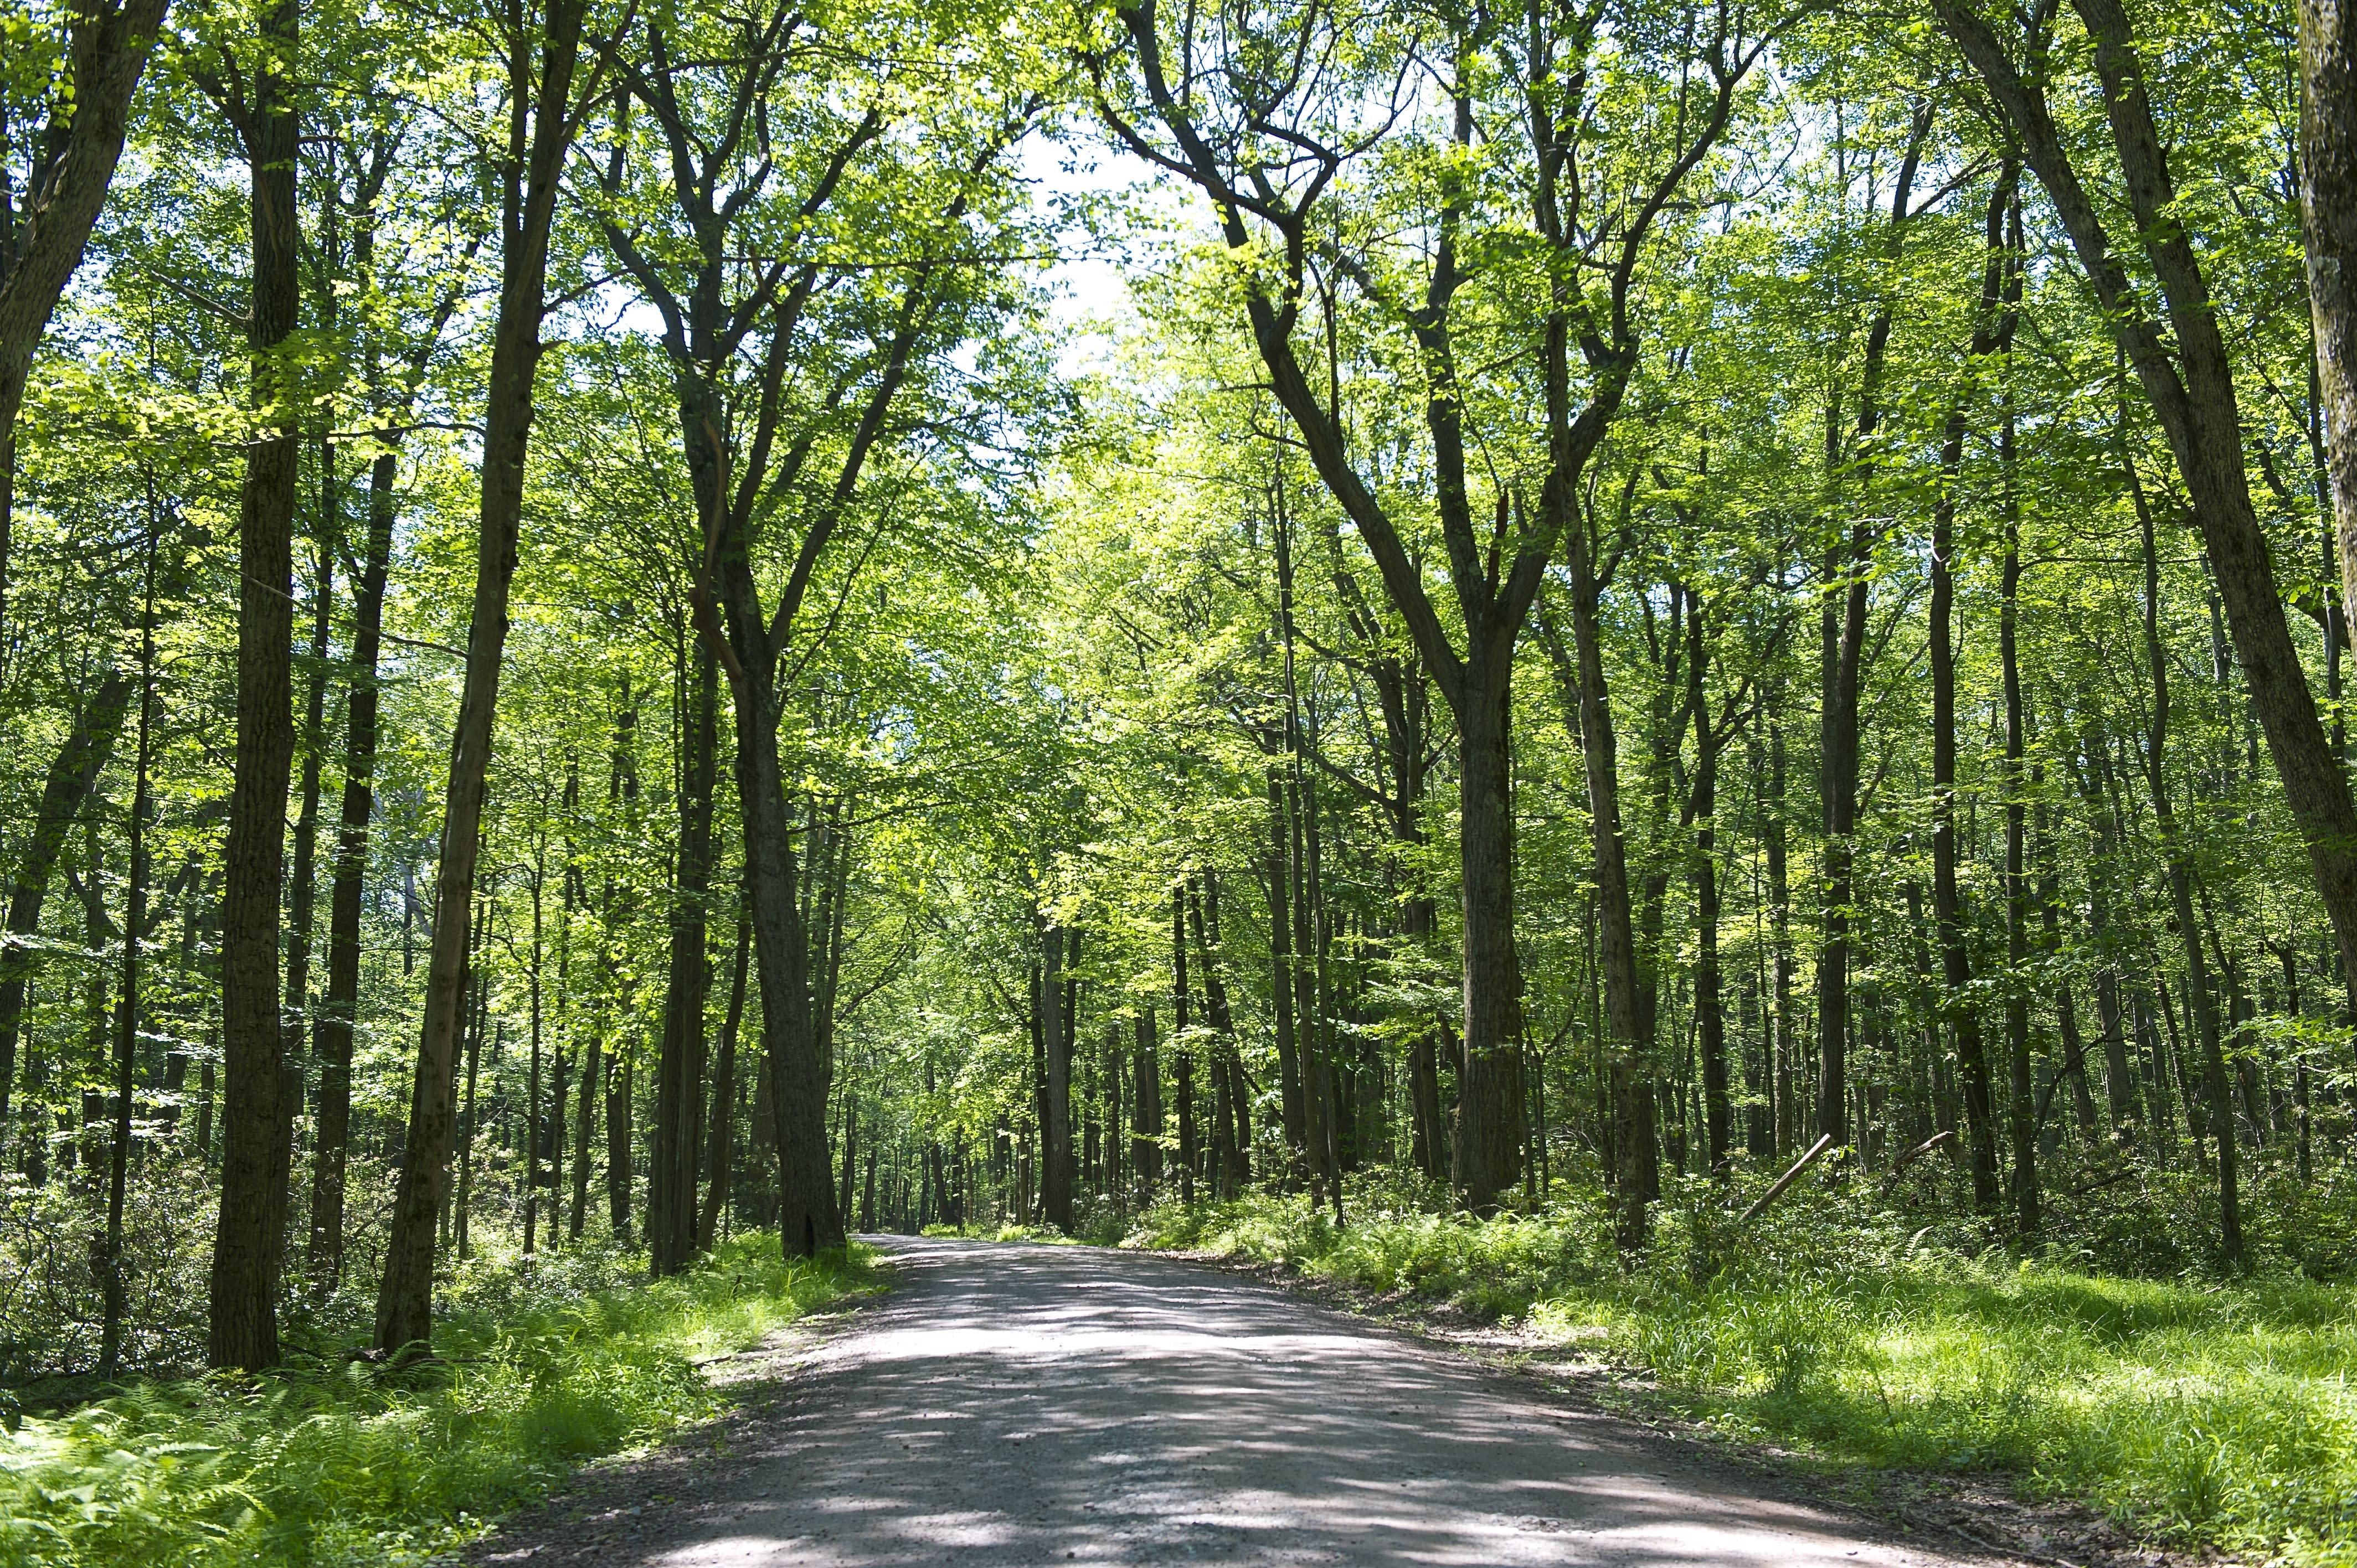 Scenic Roadway in the Pocono Mountains